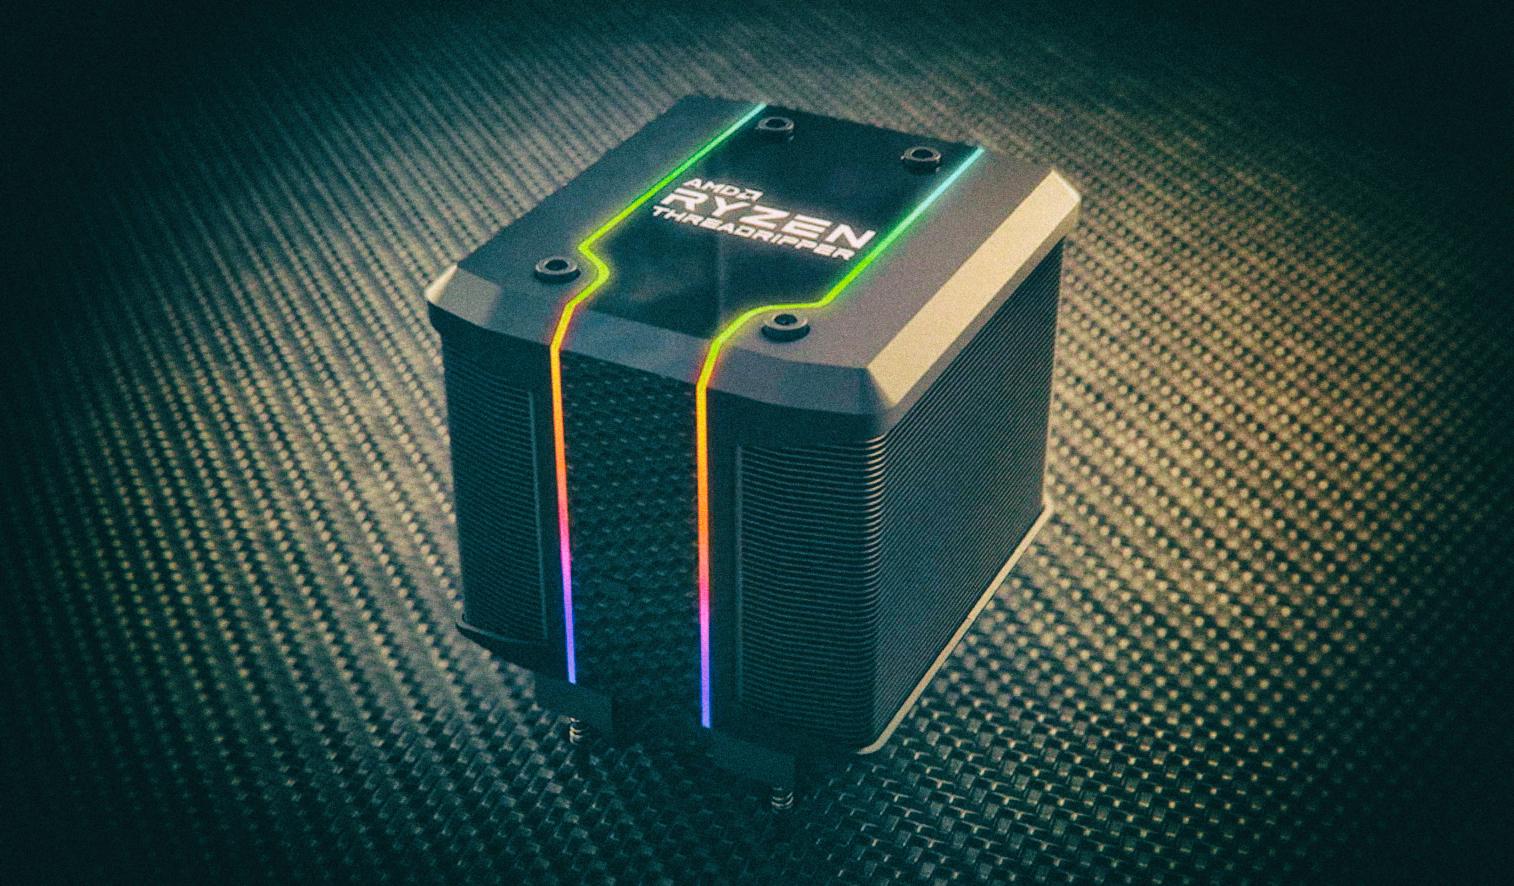 Процессор AMD Threadripper 3990X с 64 ядрами появится в 2020